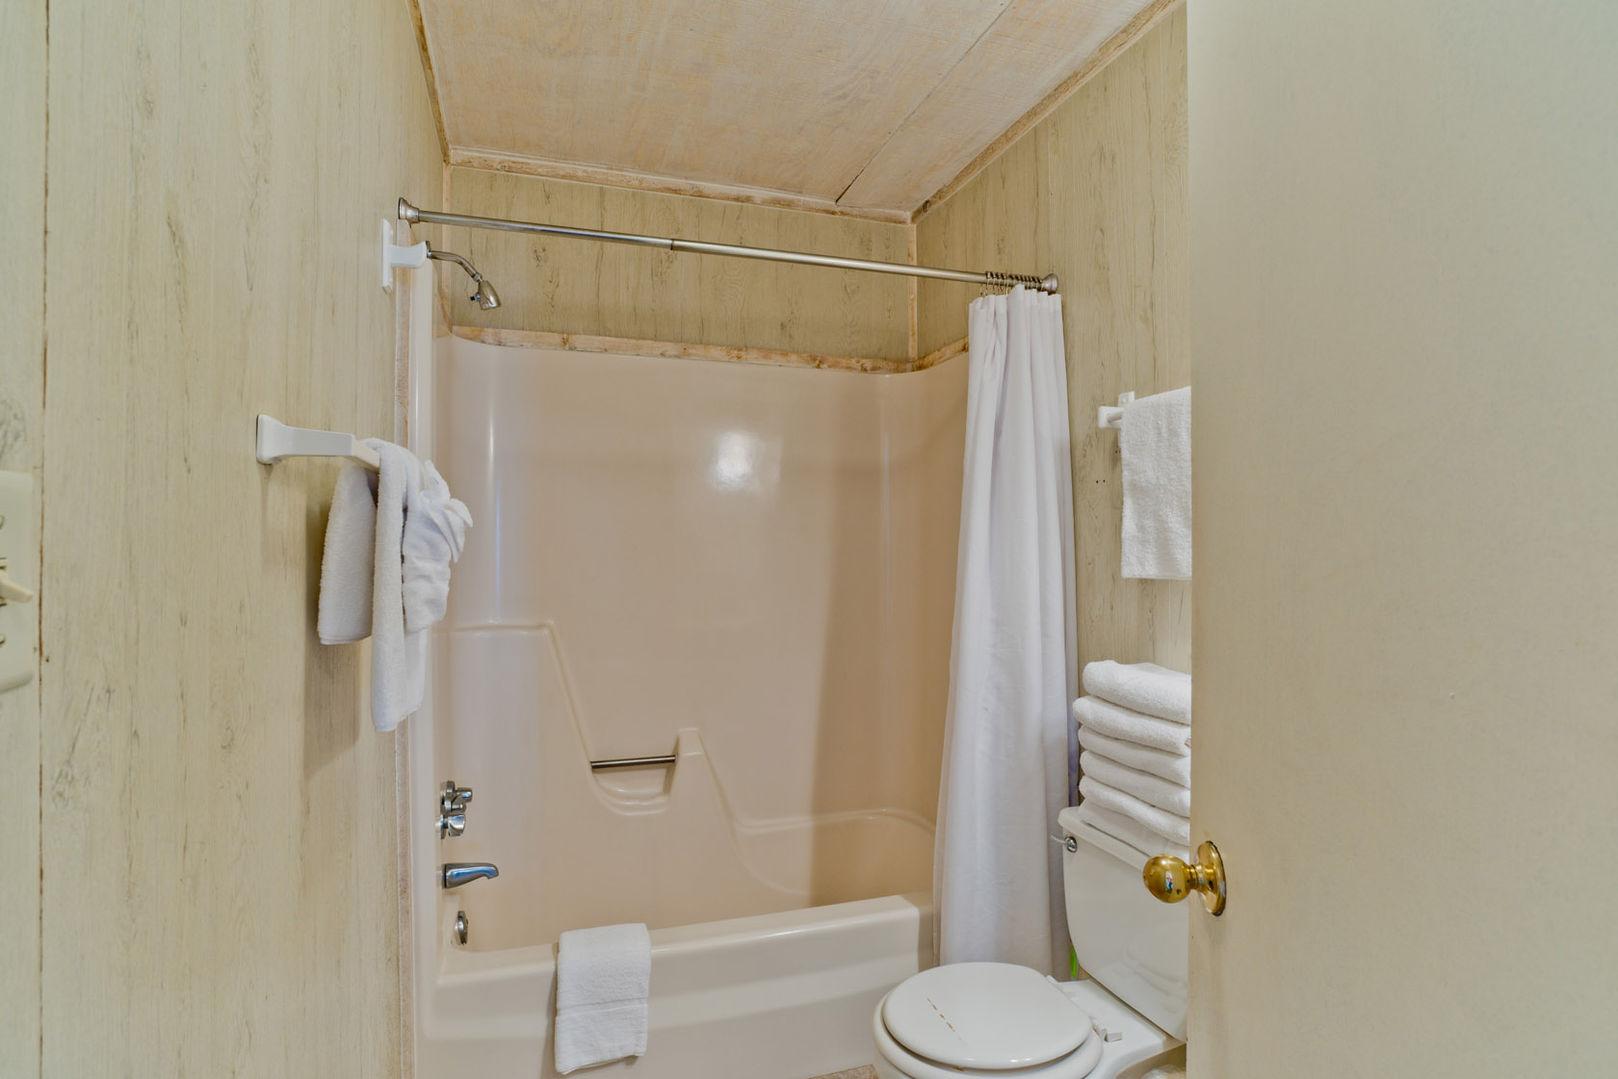 Full Guest Bathroom in our Fort Morgan Alabama Beach Rental